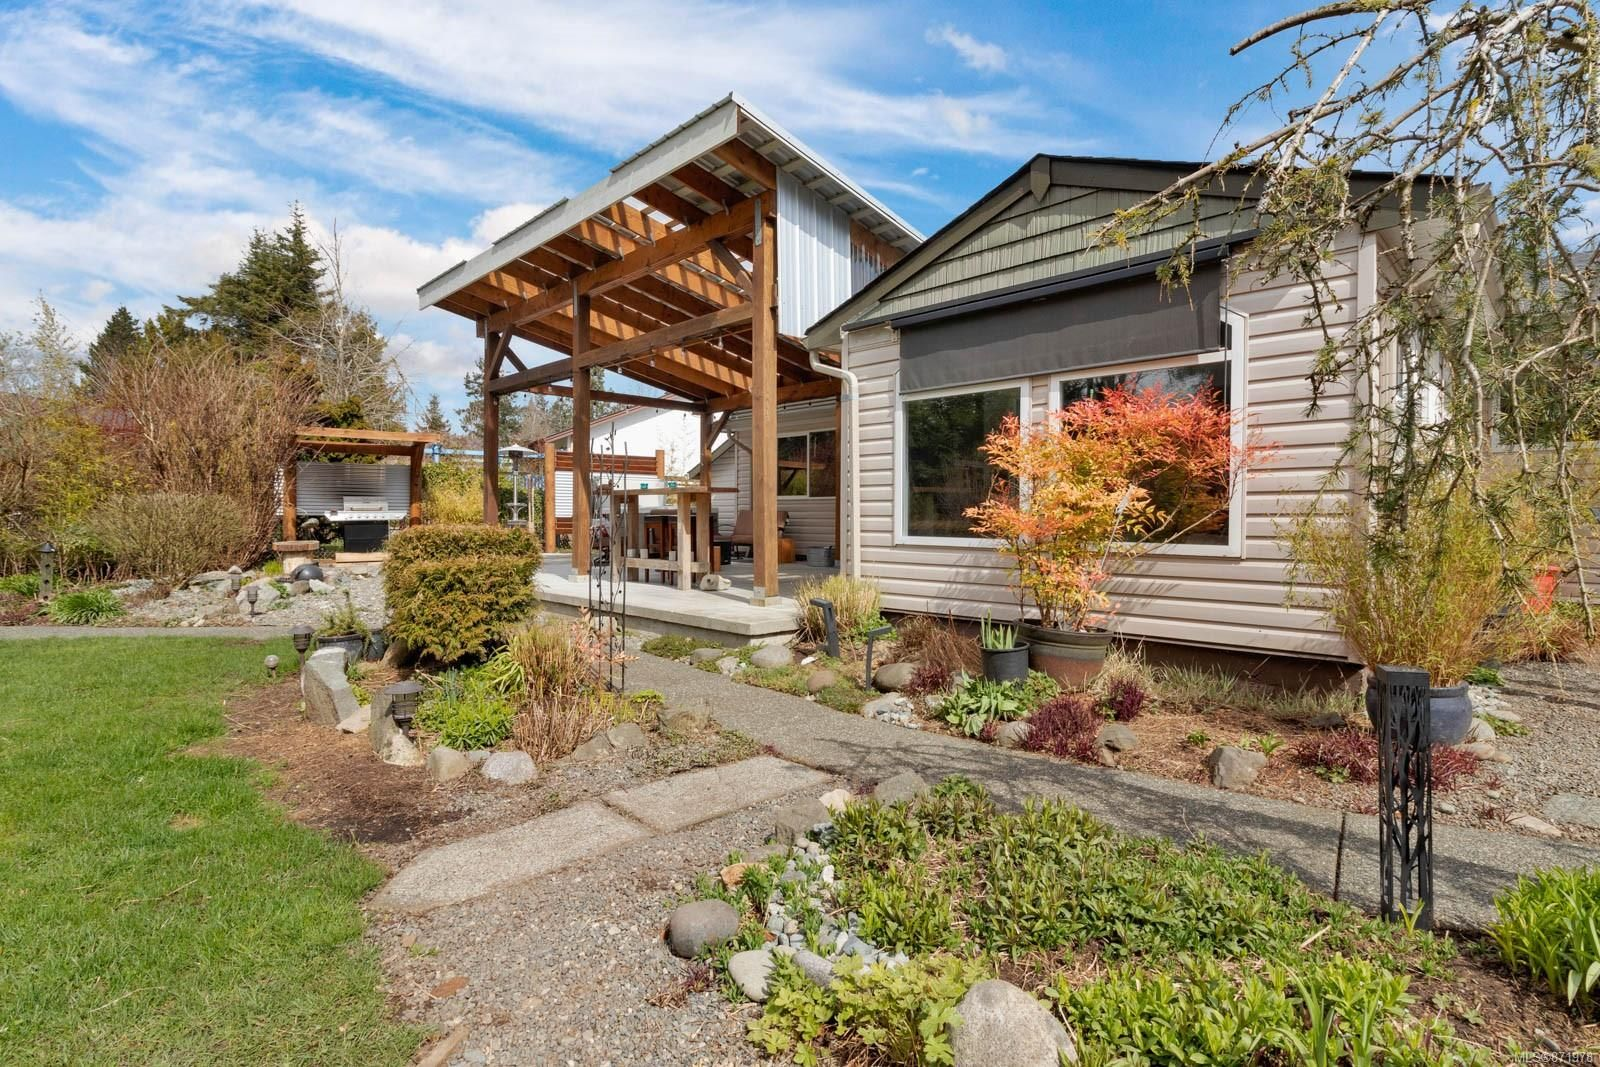 Photo 29: Photos: 1539 Chilcotin Cres in : CV Comox (Town of) House for sale (Comox Valley)  : MLS®# 871978